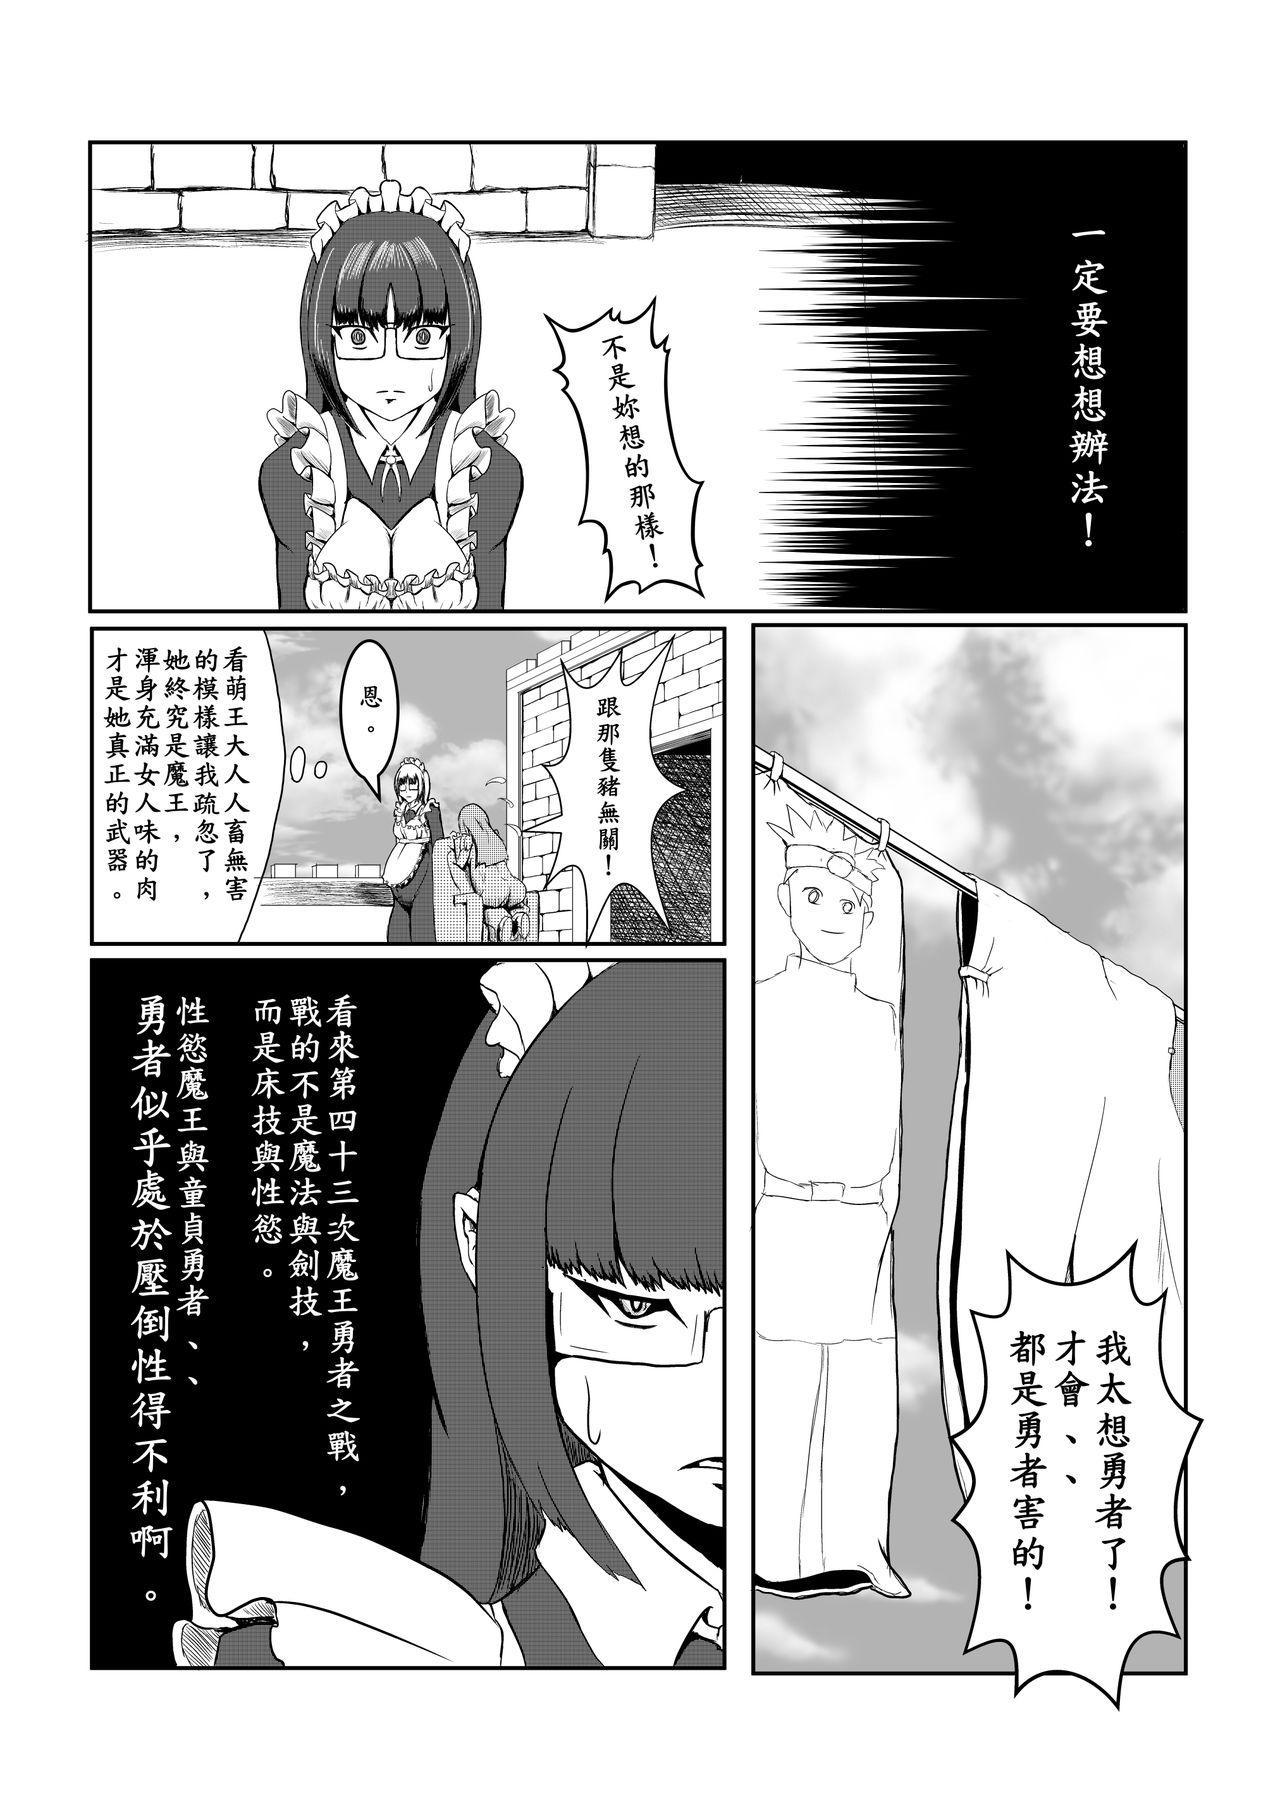 Maou Yuusha - Kachiku Kiki 3 39